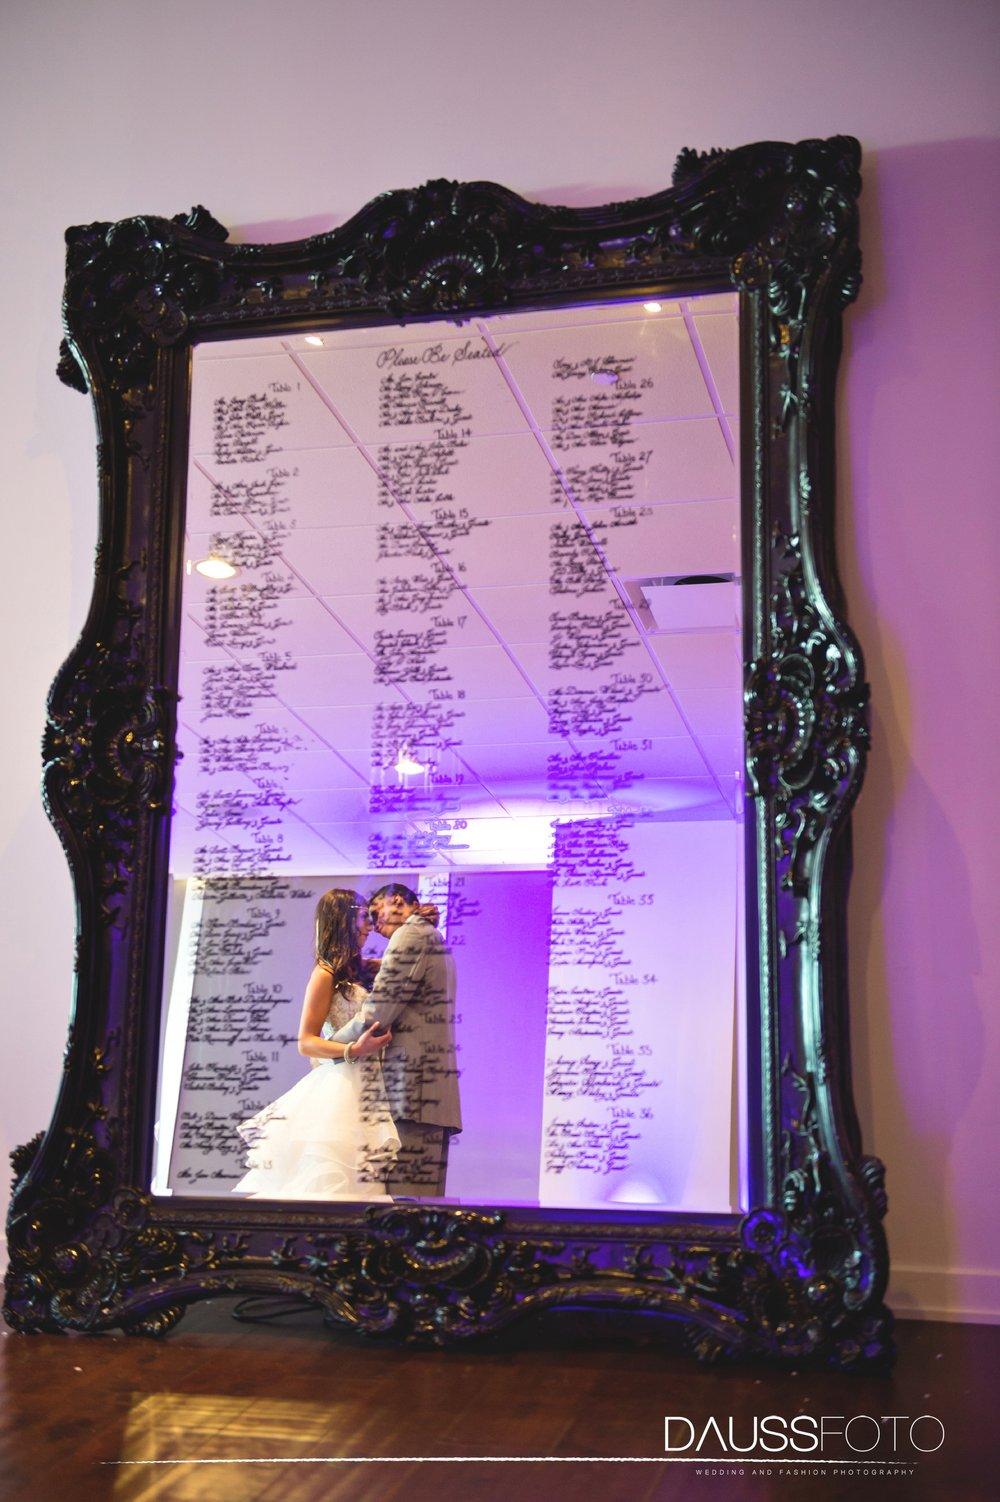 DaussFOTO_20150721_105_Indiana Wedding Photographer.jpg